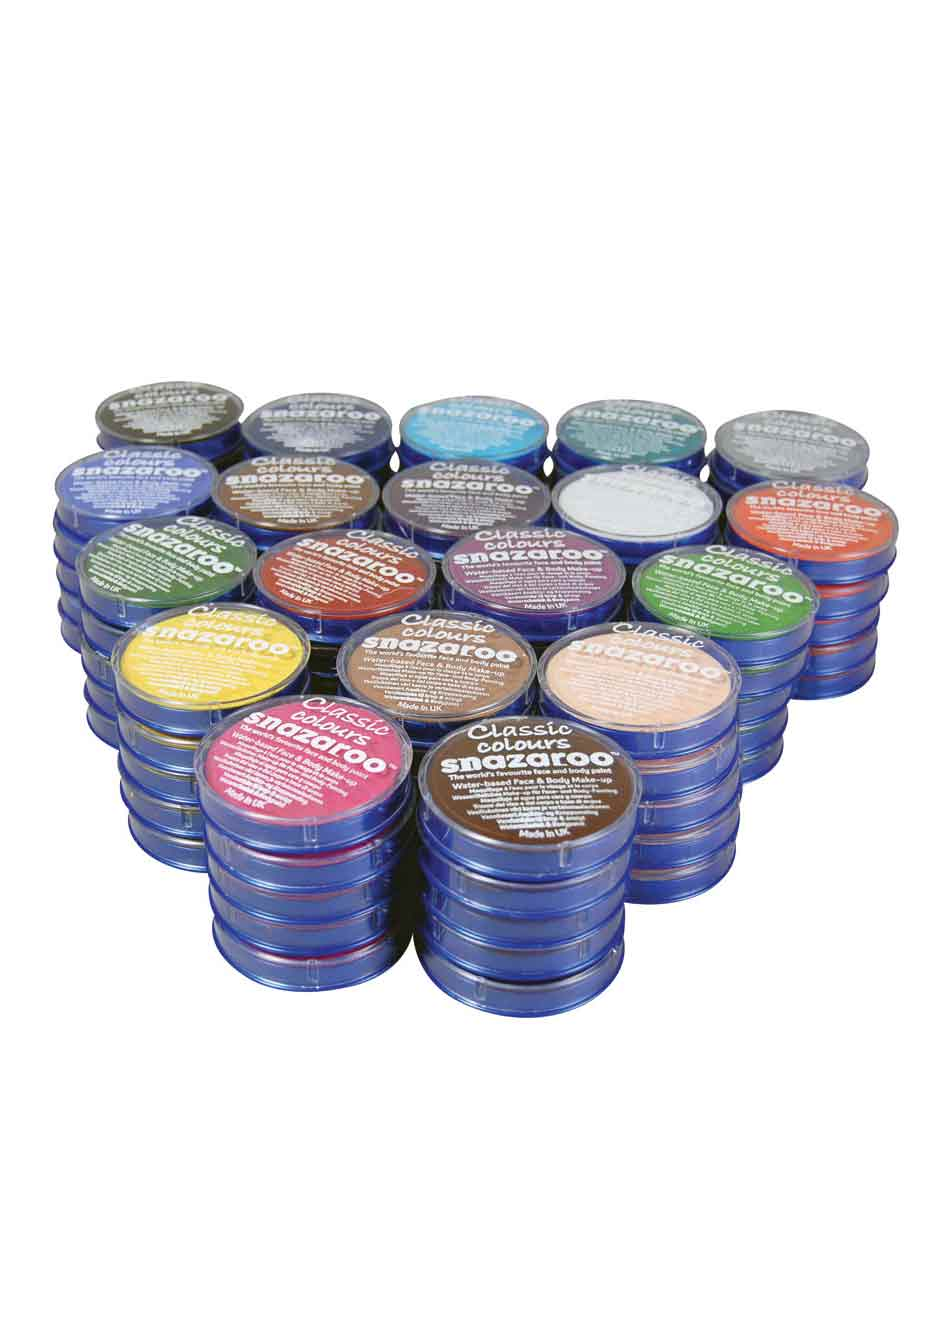 snazaroo-mix-classic-colors